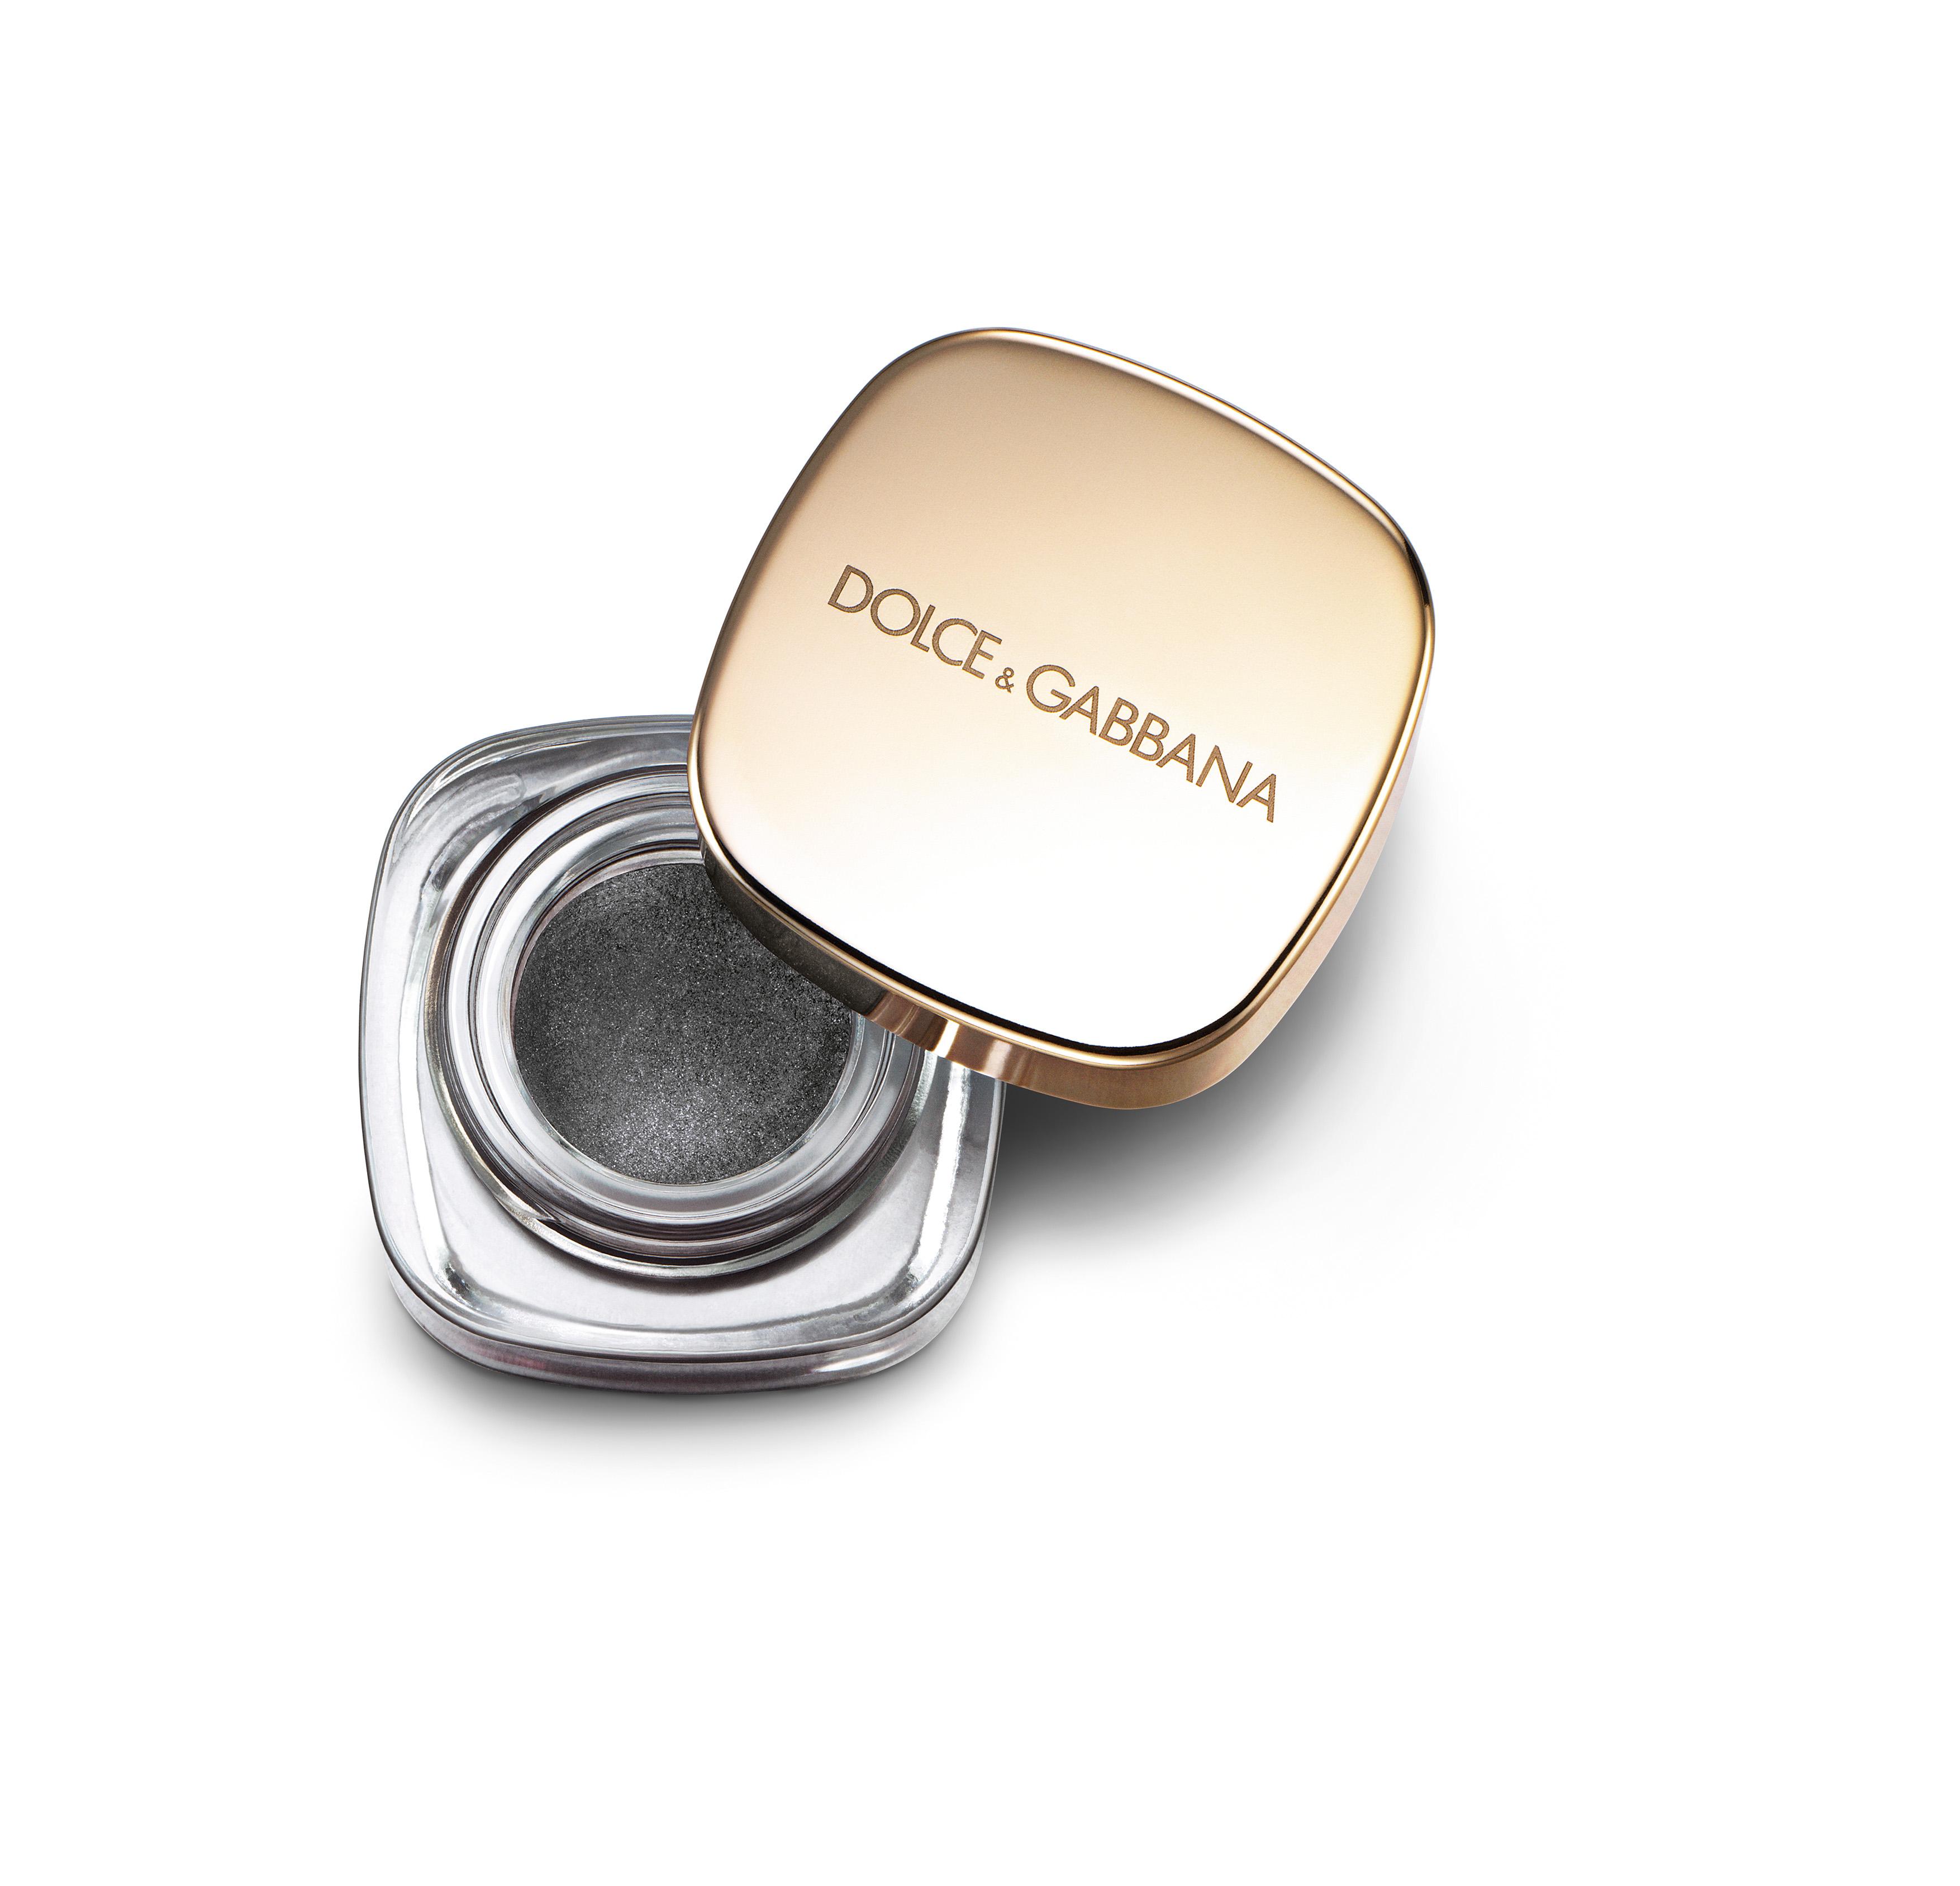 Dolce & Gabbana Perfect Mono Stromboli 130